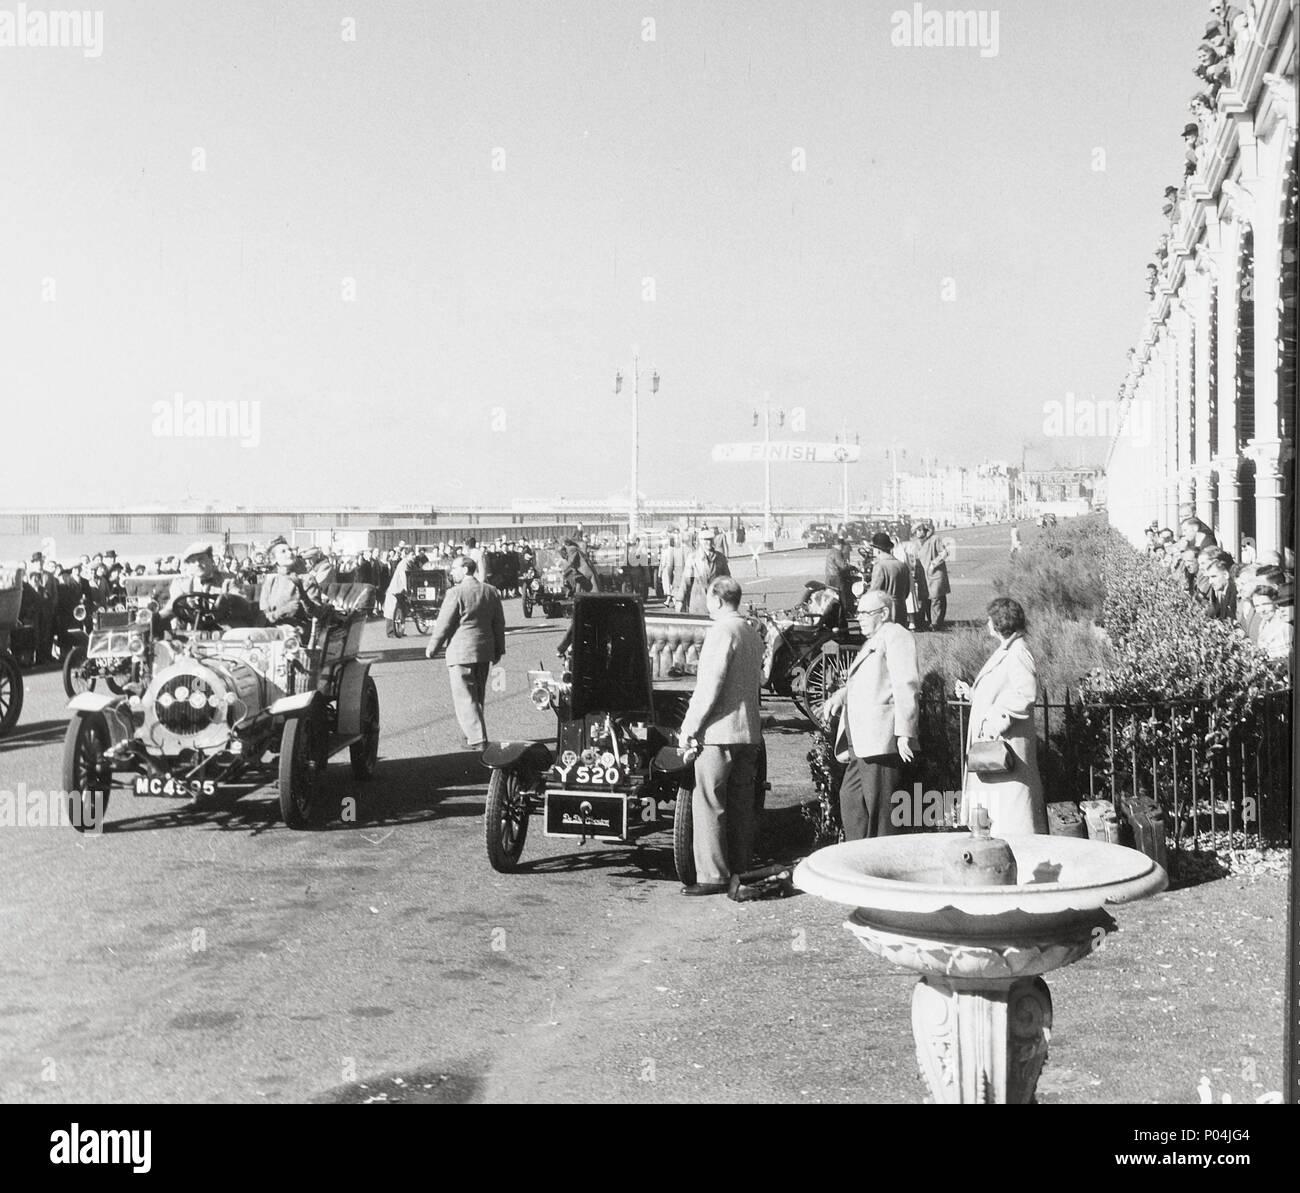 Original Film Title: GENEVIÈVE.  English Title: GENEVIÈVE.  Film Director: HENRY CORNELIUS.  Year: 1953. Credit: UNIVERSAL PICTURES / Album Stock Photo